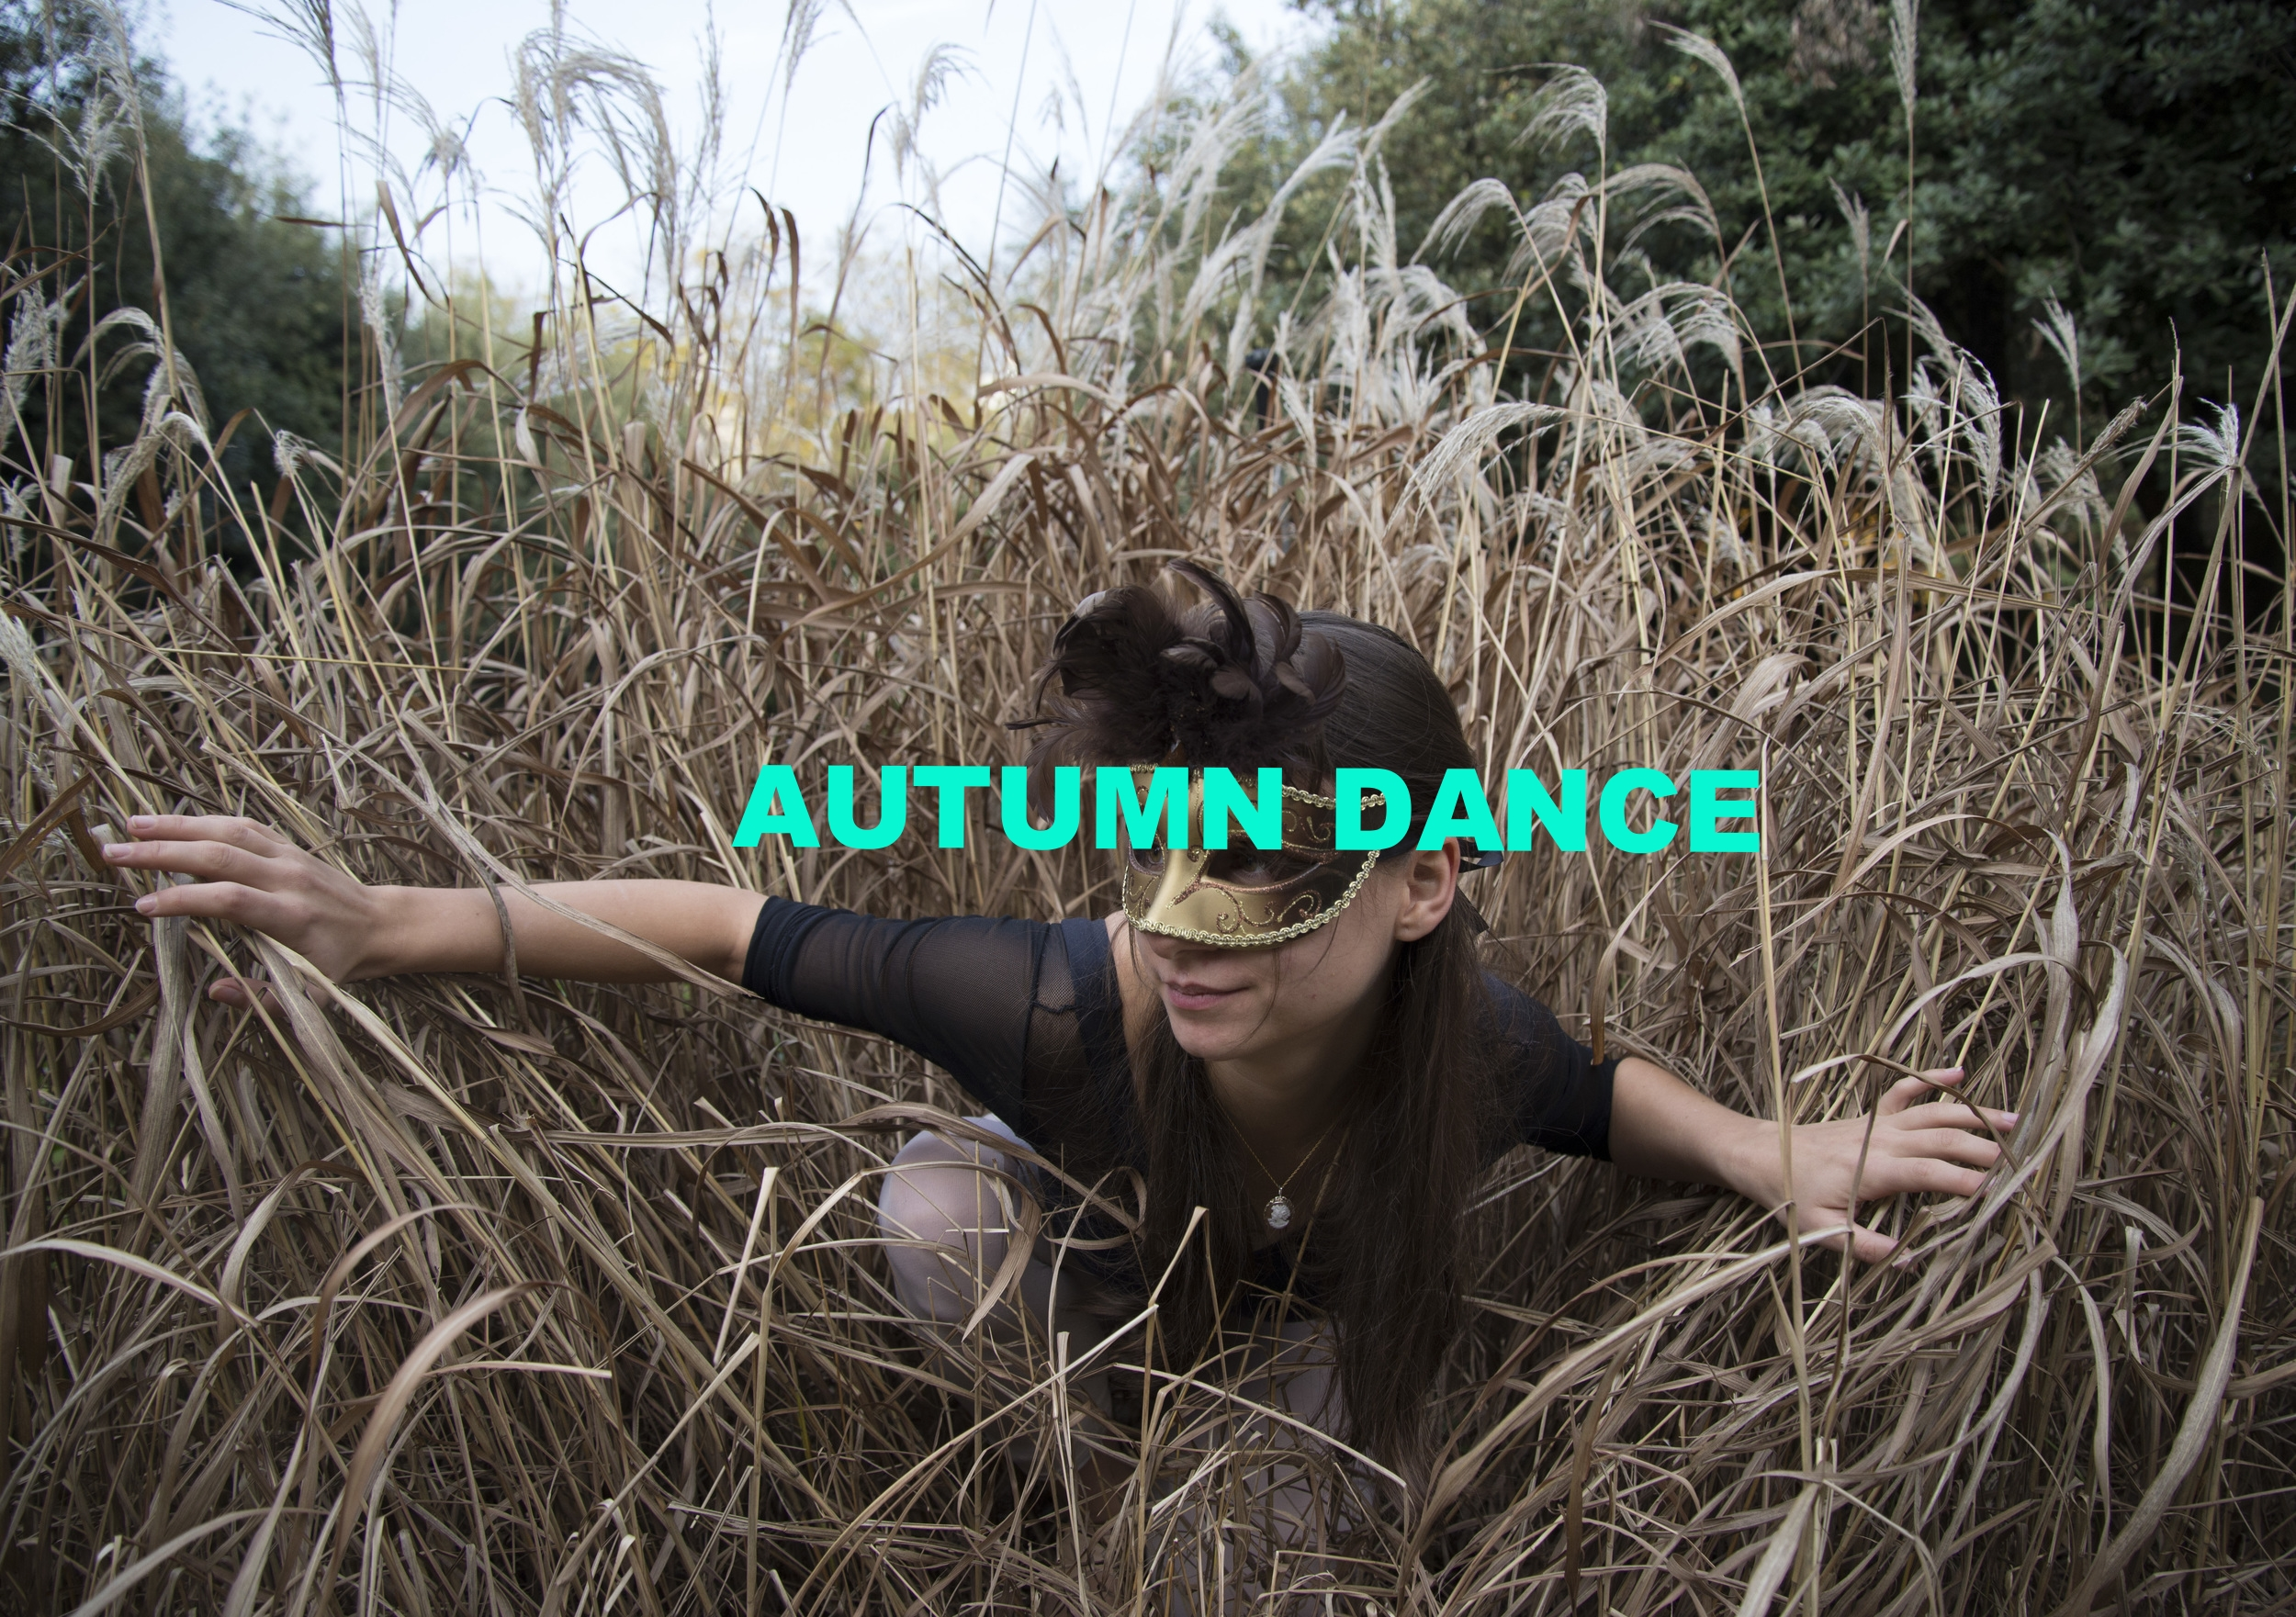 Autumn Dance, 2015